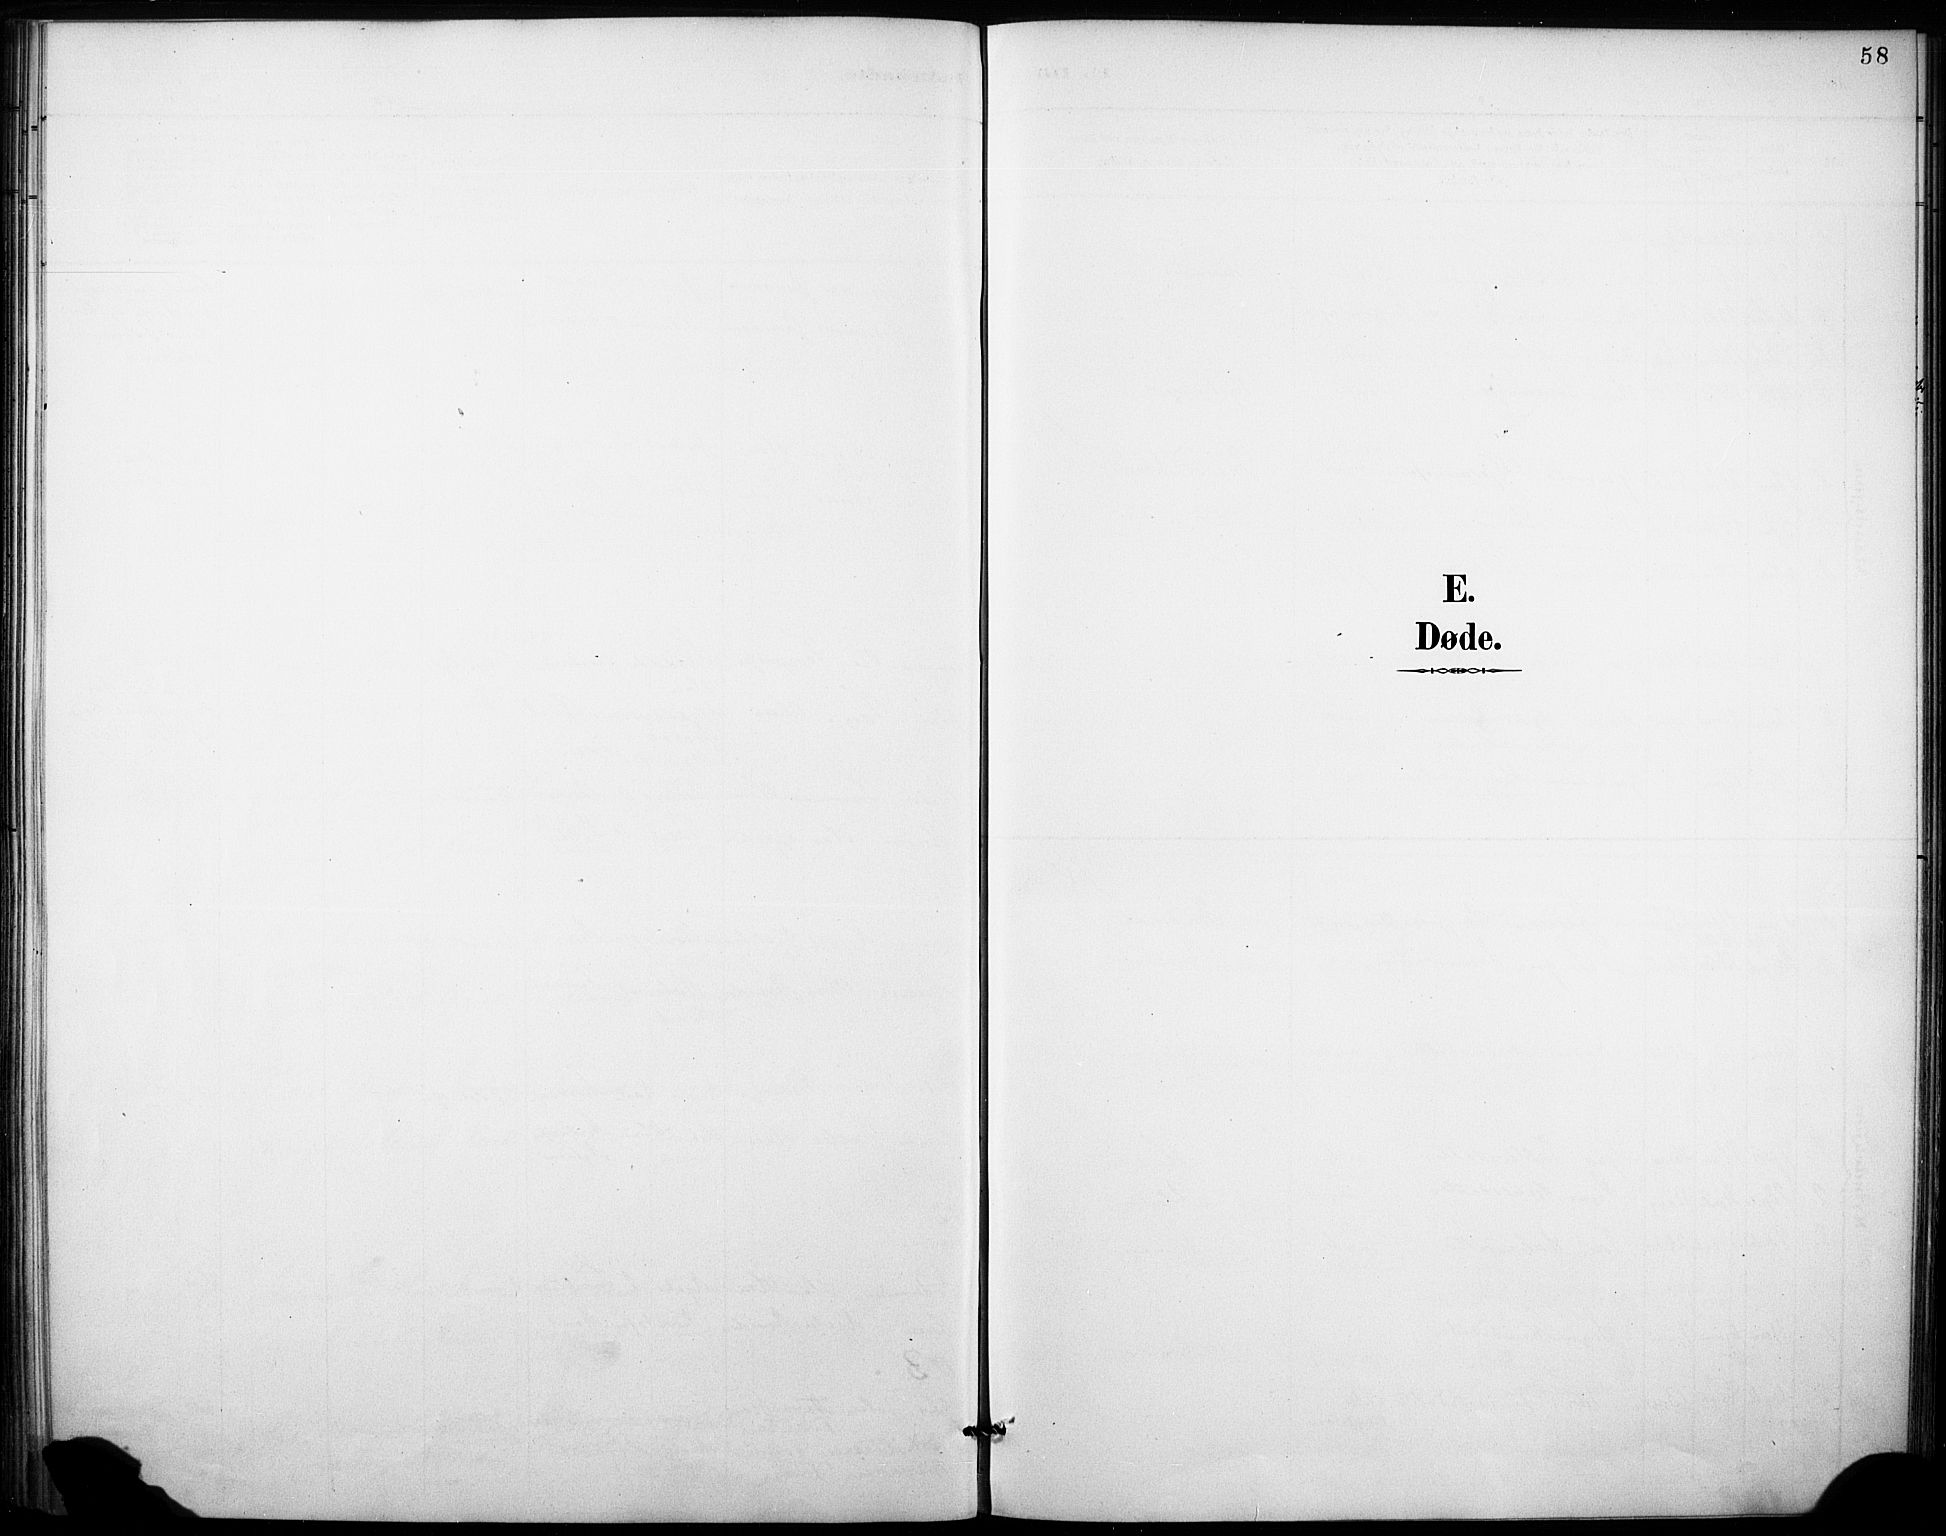 SAKO, Fyresdal kirkebøker, F/Fb/L0003: Ministerialbok nr. II 3, 1887-1903, s. 58